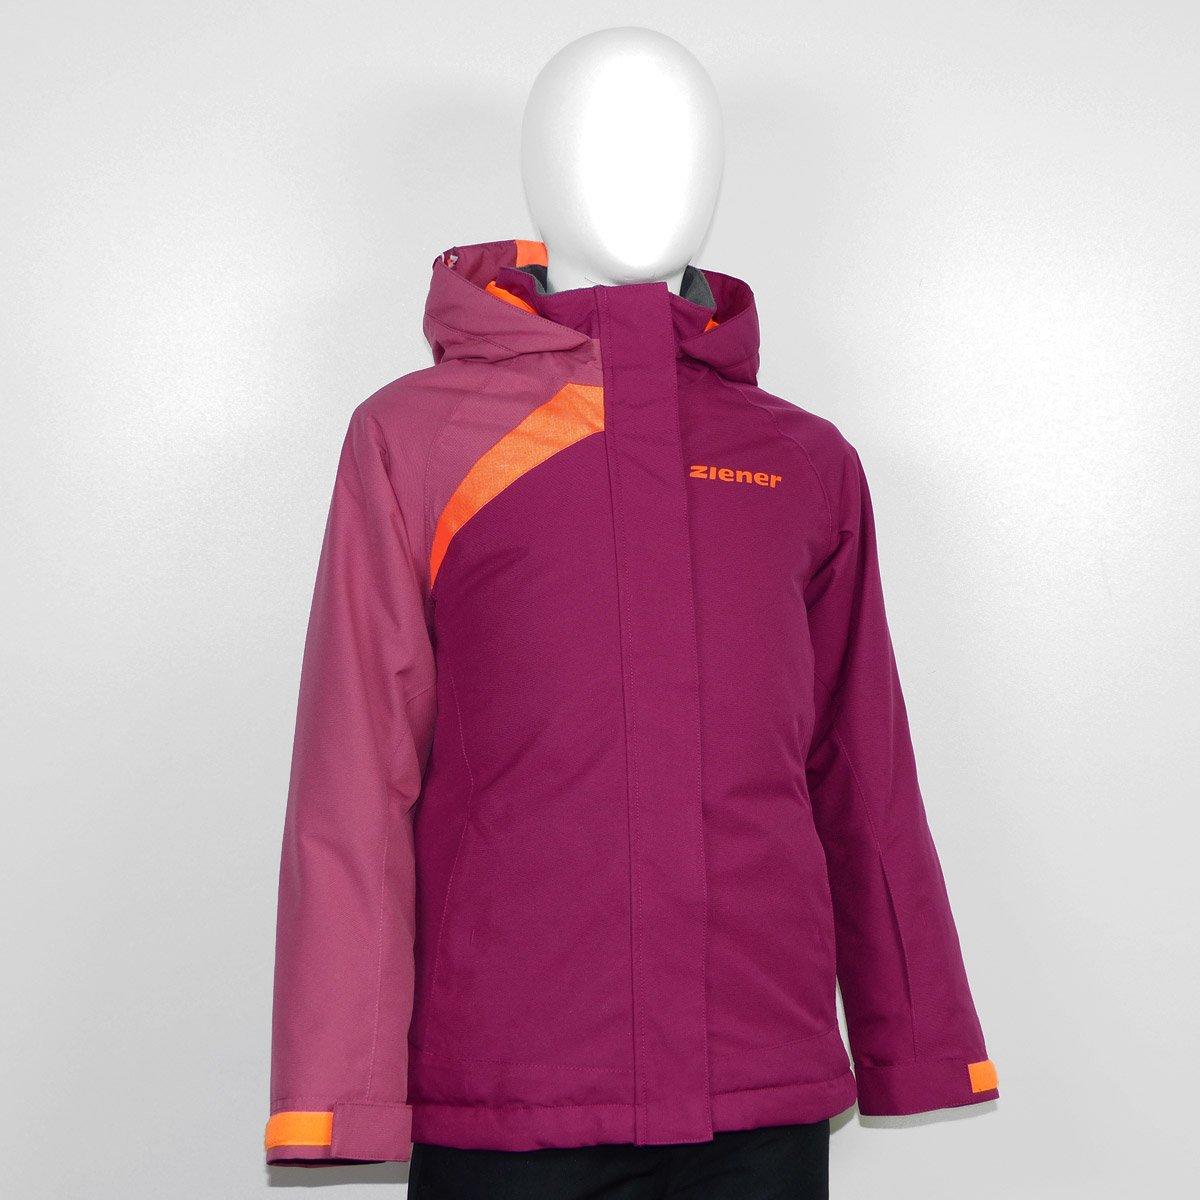 ZIENER ADELE 2014/15 Kinder Skijacke Snowboardjacke 10.000mm AQUASHIELD 147901 jetzt bestellen